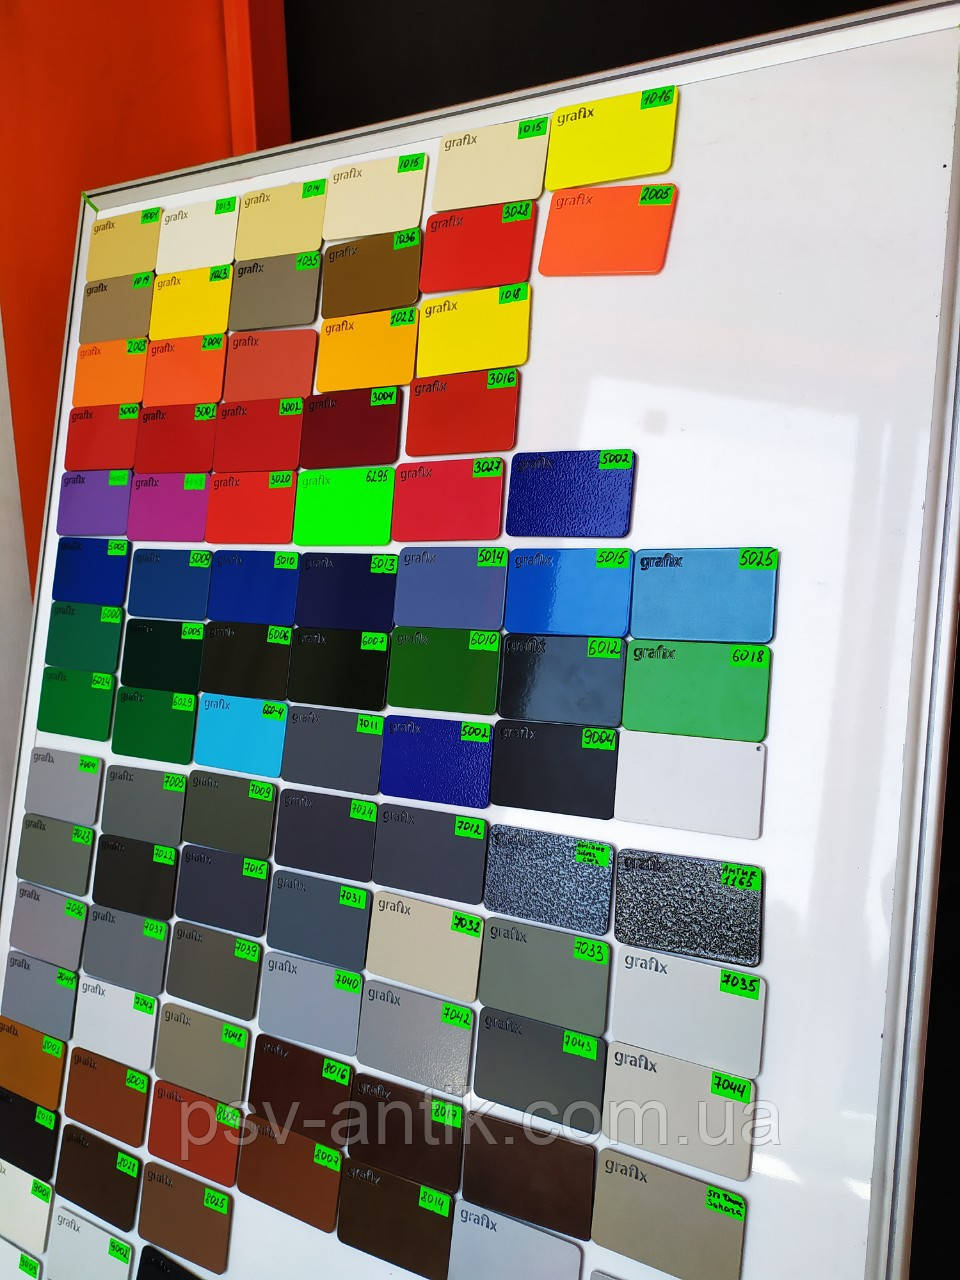 Порошковая краска глянцевая, полиэфирная, архитектурная, 7000